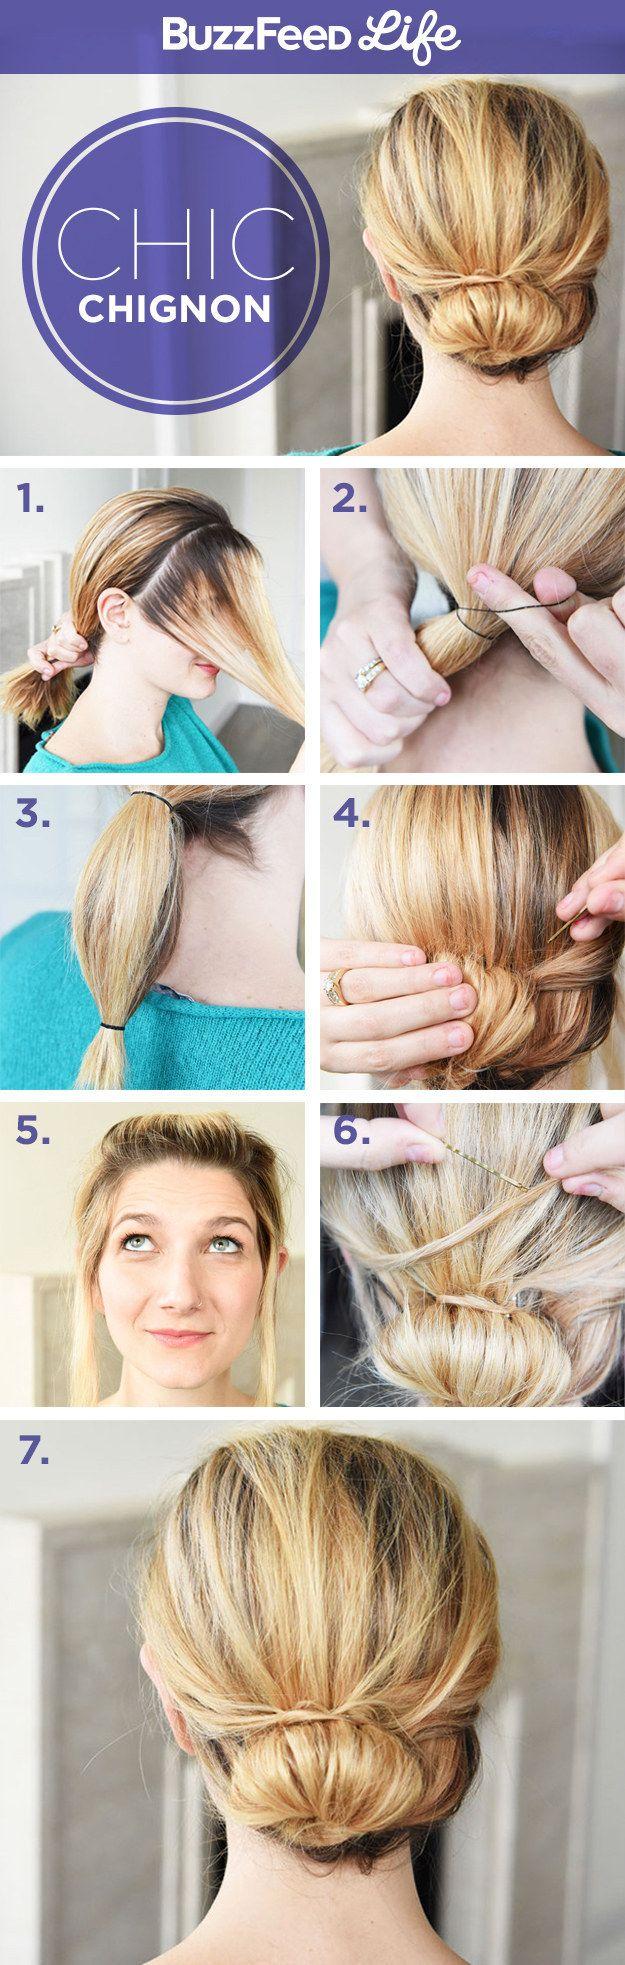 The best images about como arrumar o cabelo on pinterest